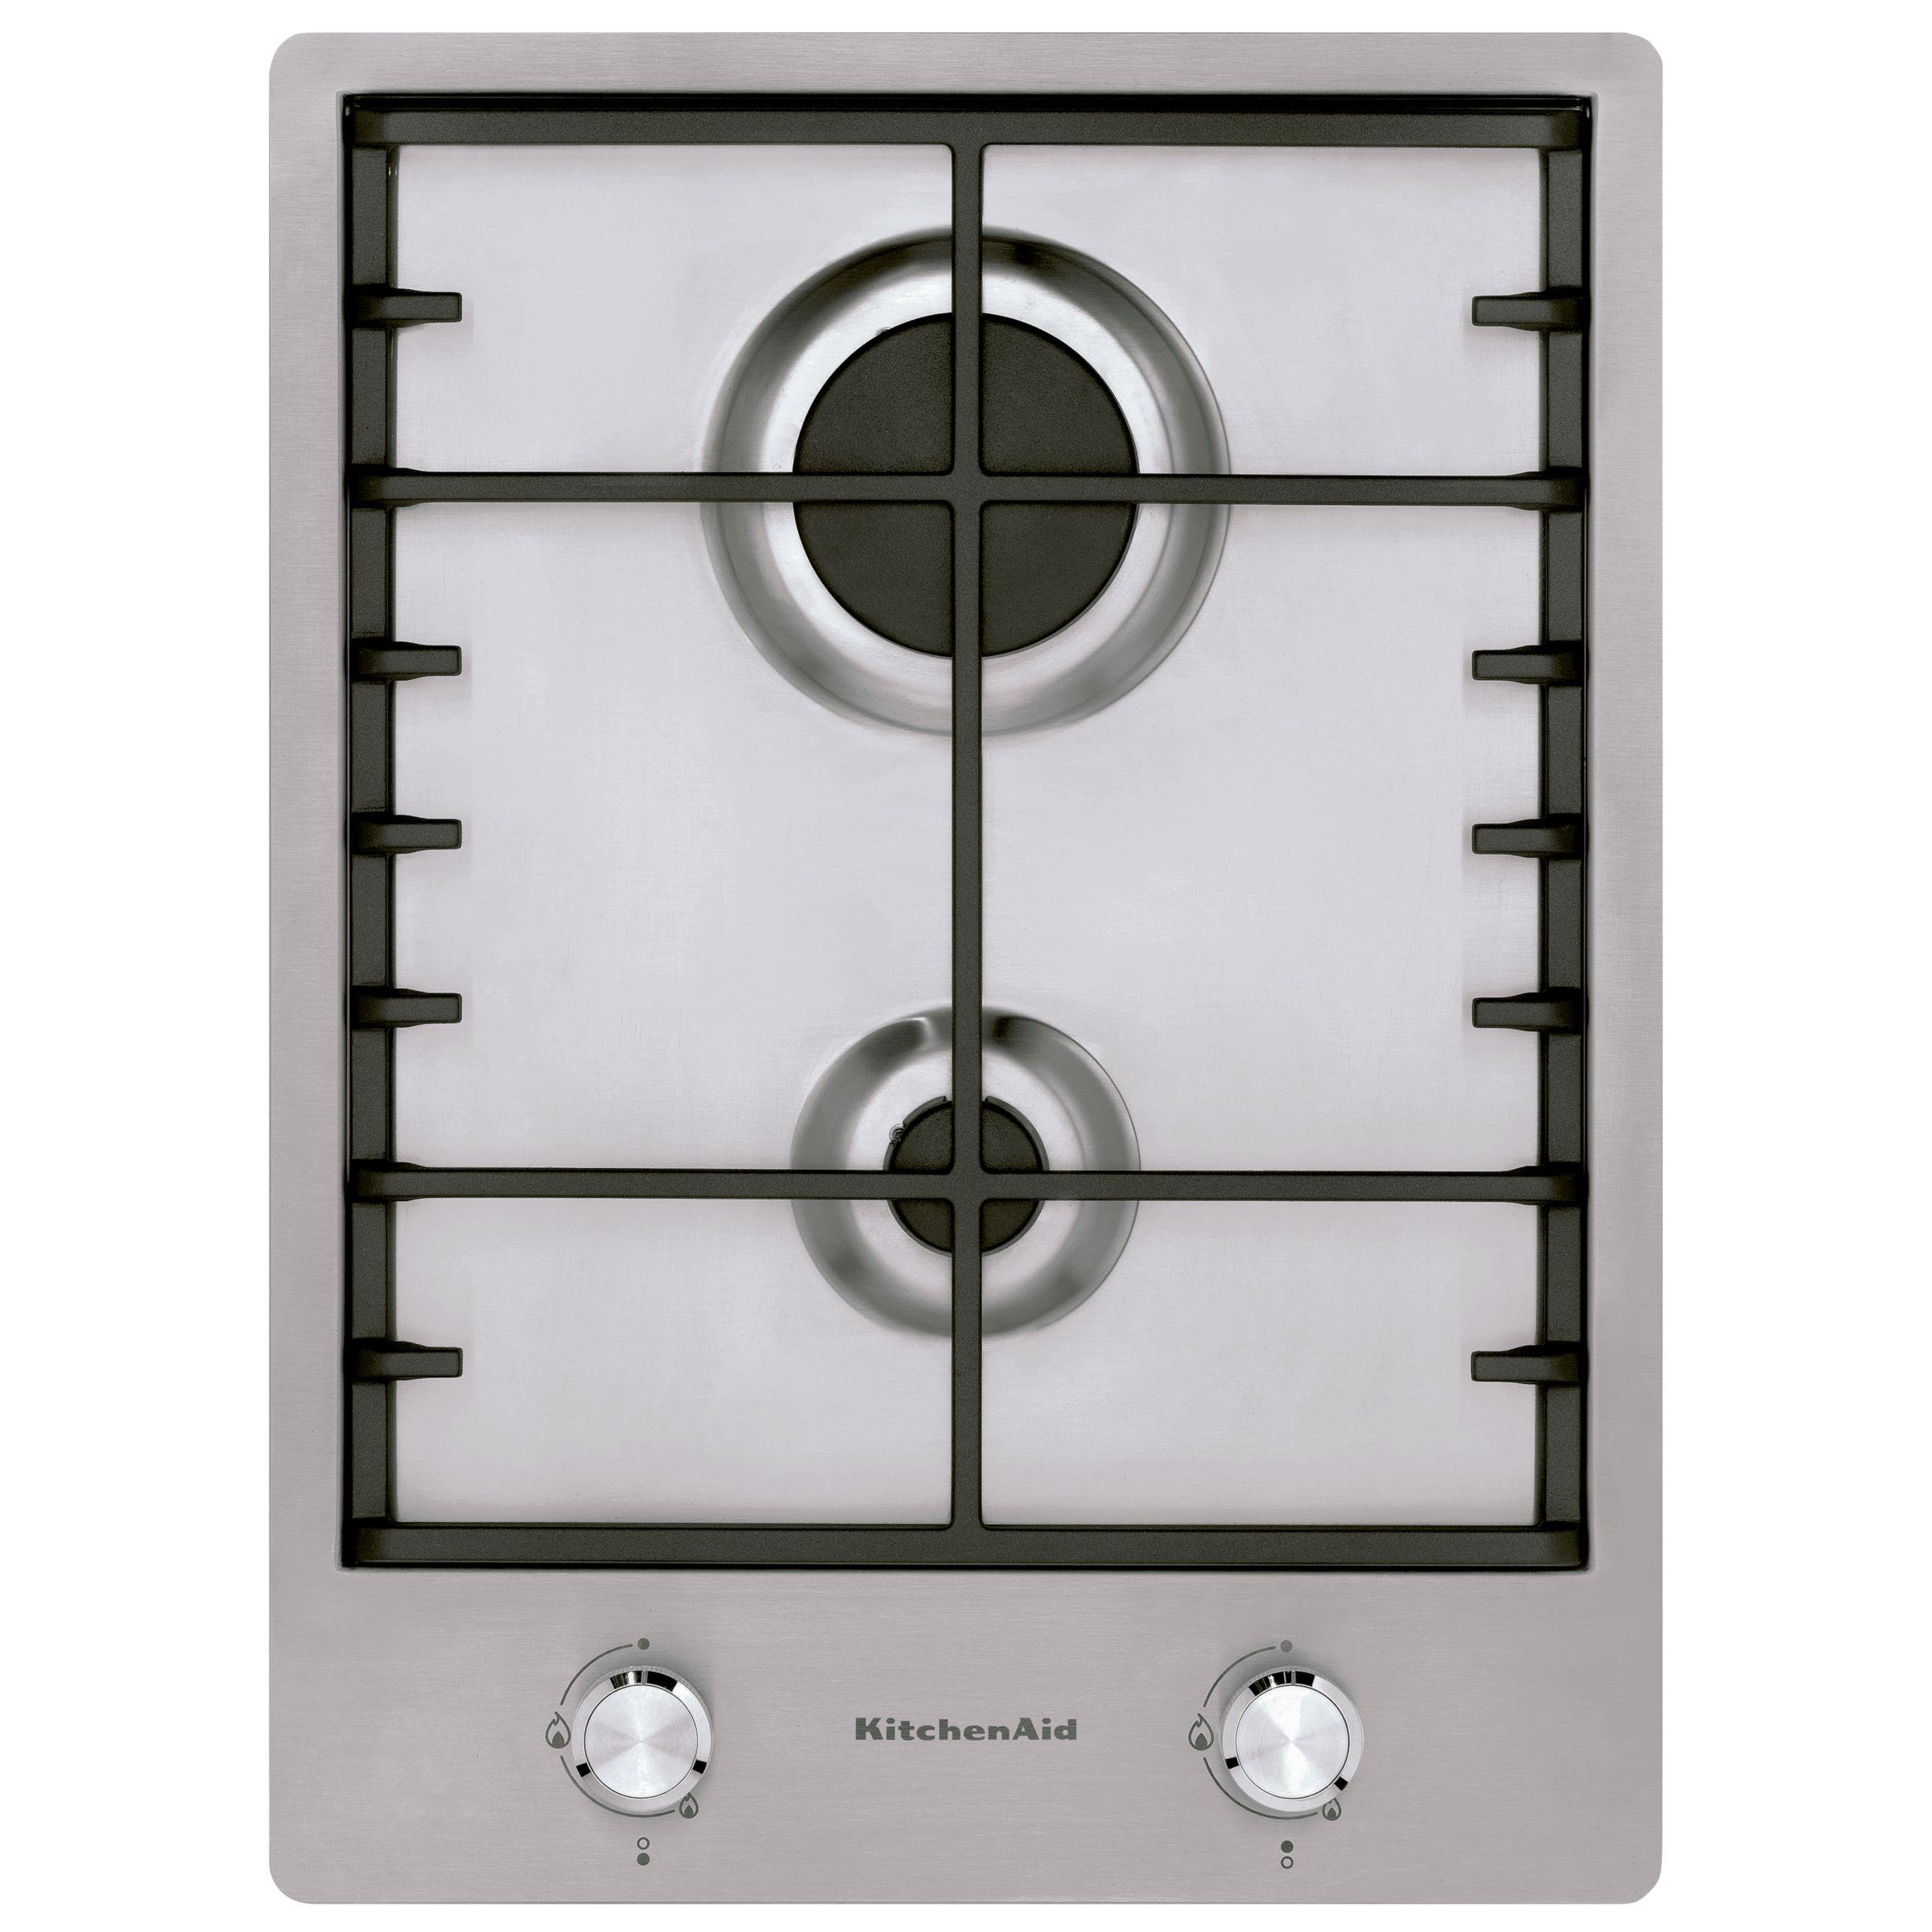 KitchenAid KitchenAid KHDD238510 Integrated Gas Hob, Stainless Steel